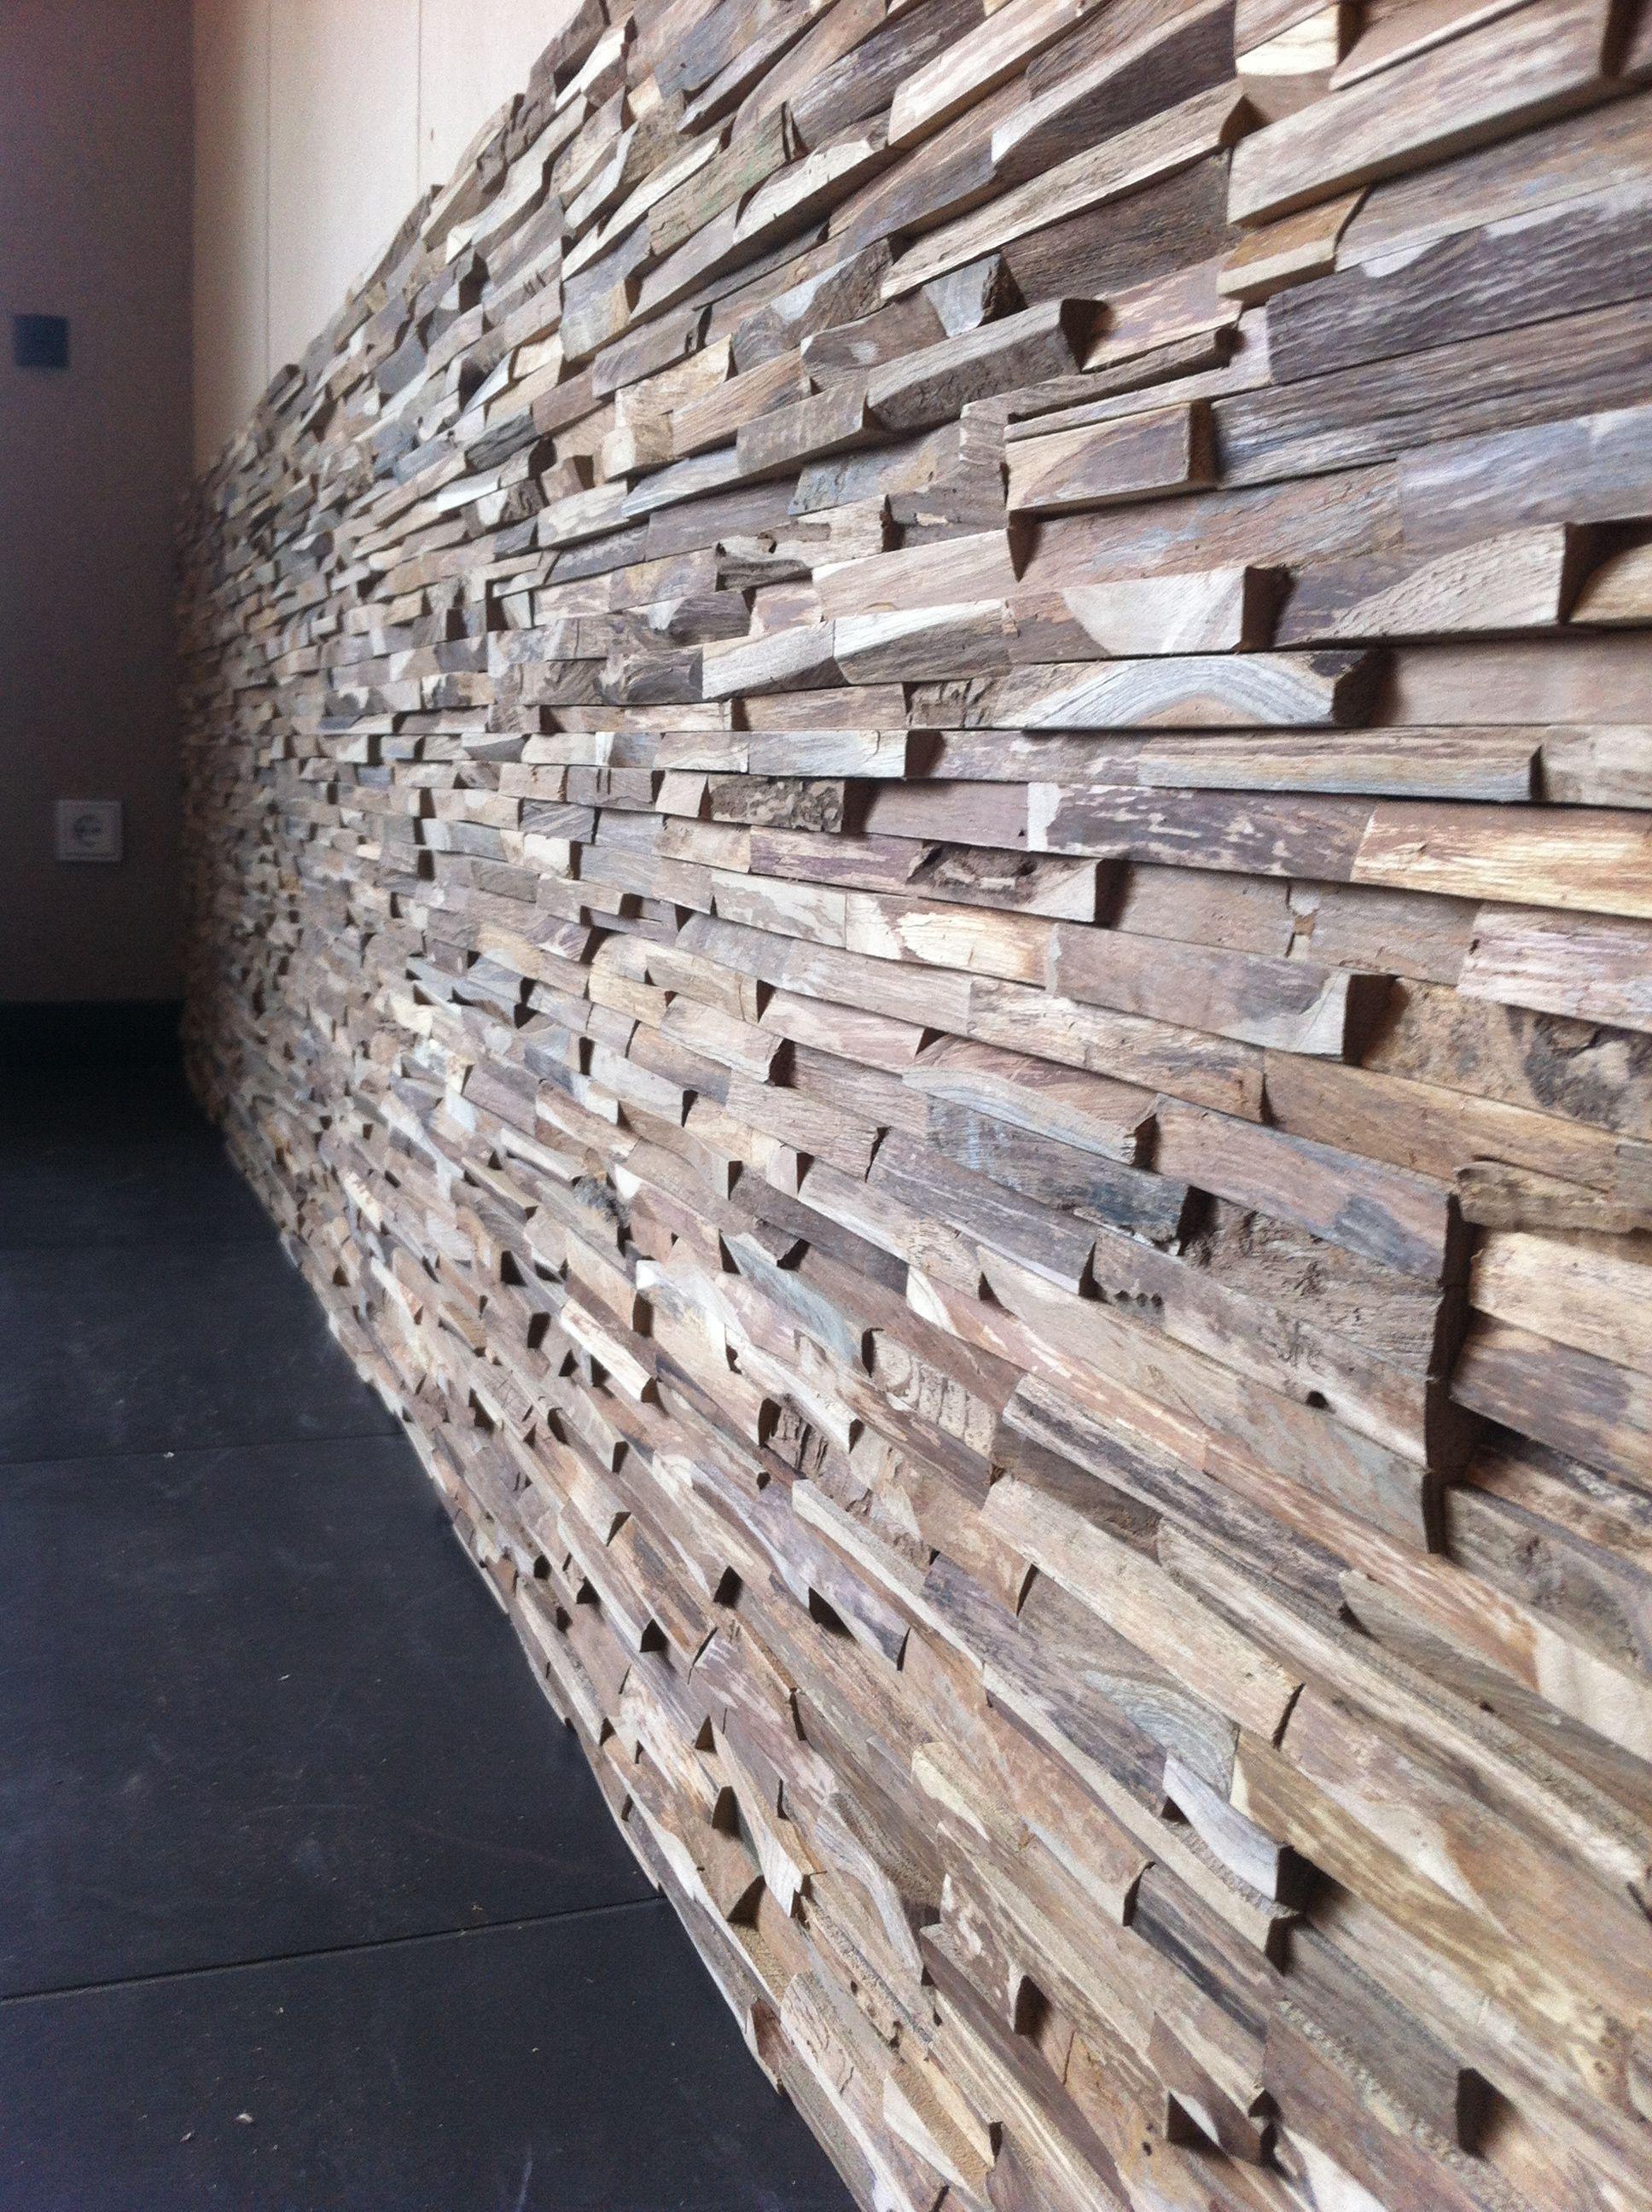 Bs Holzdesign Gmbh Wandverkleidung Holz Wandverkleidung Holzwandverkleidung